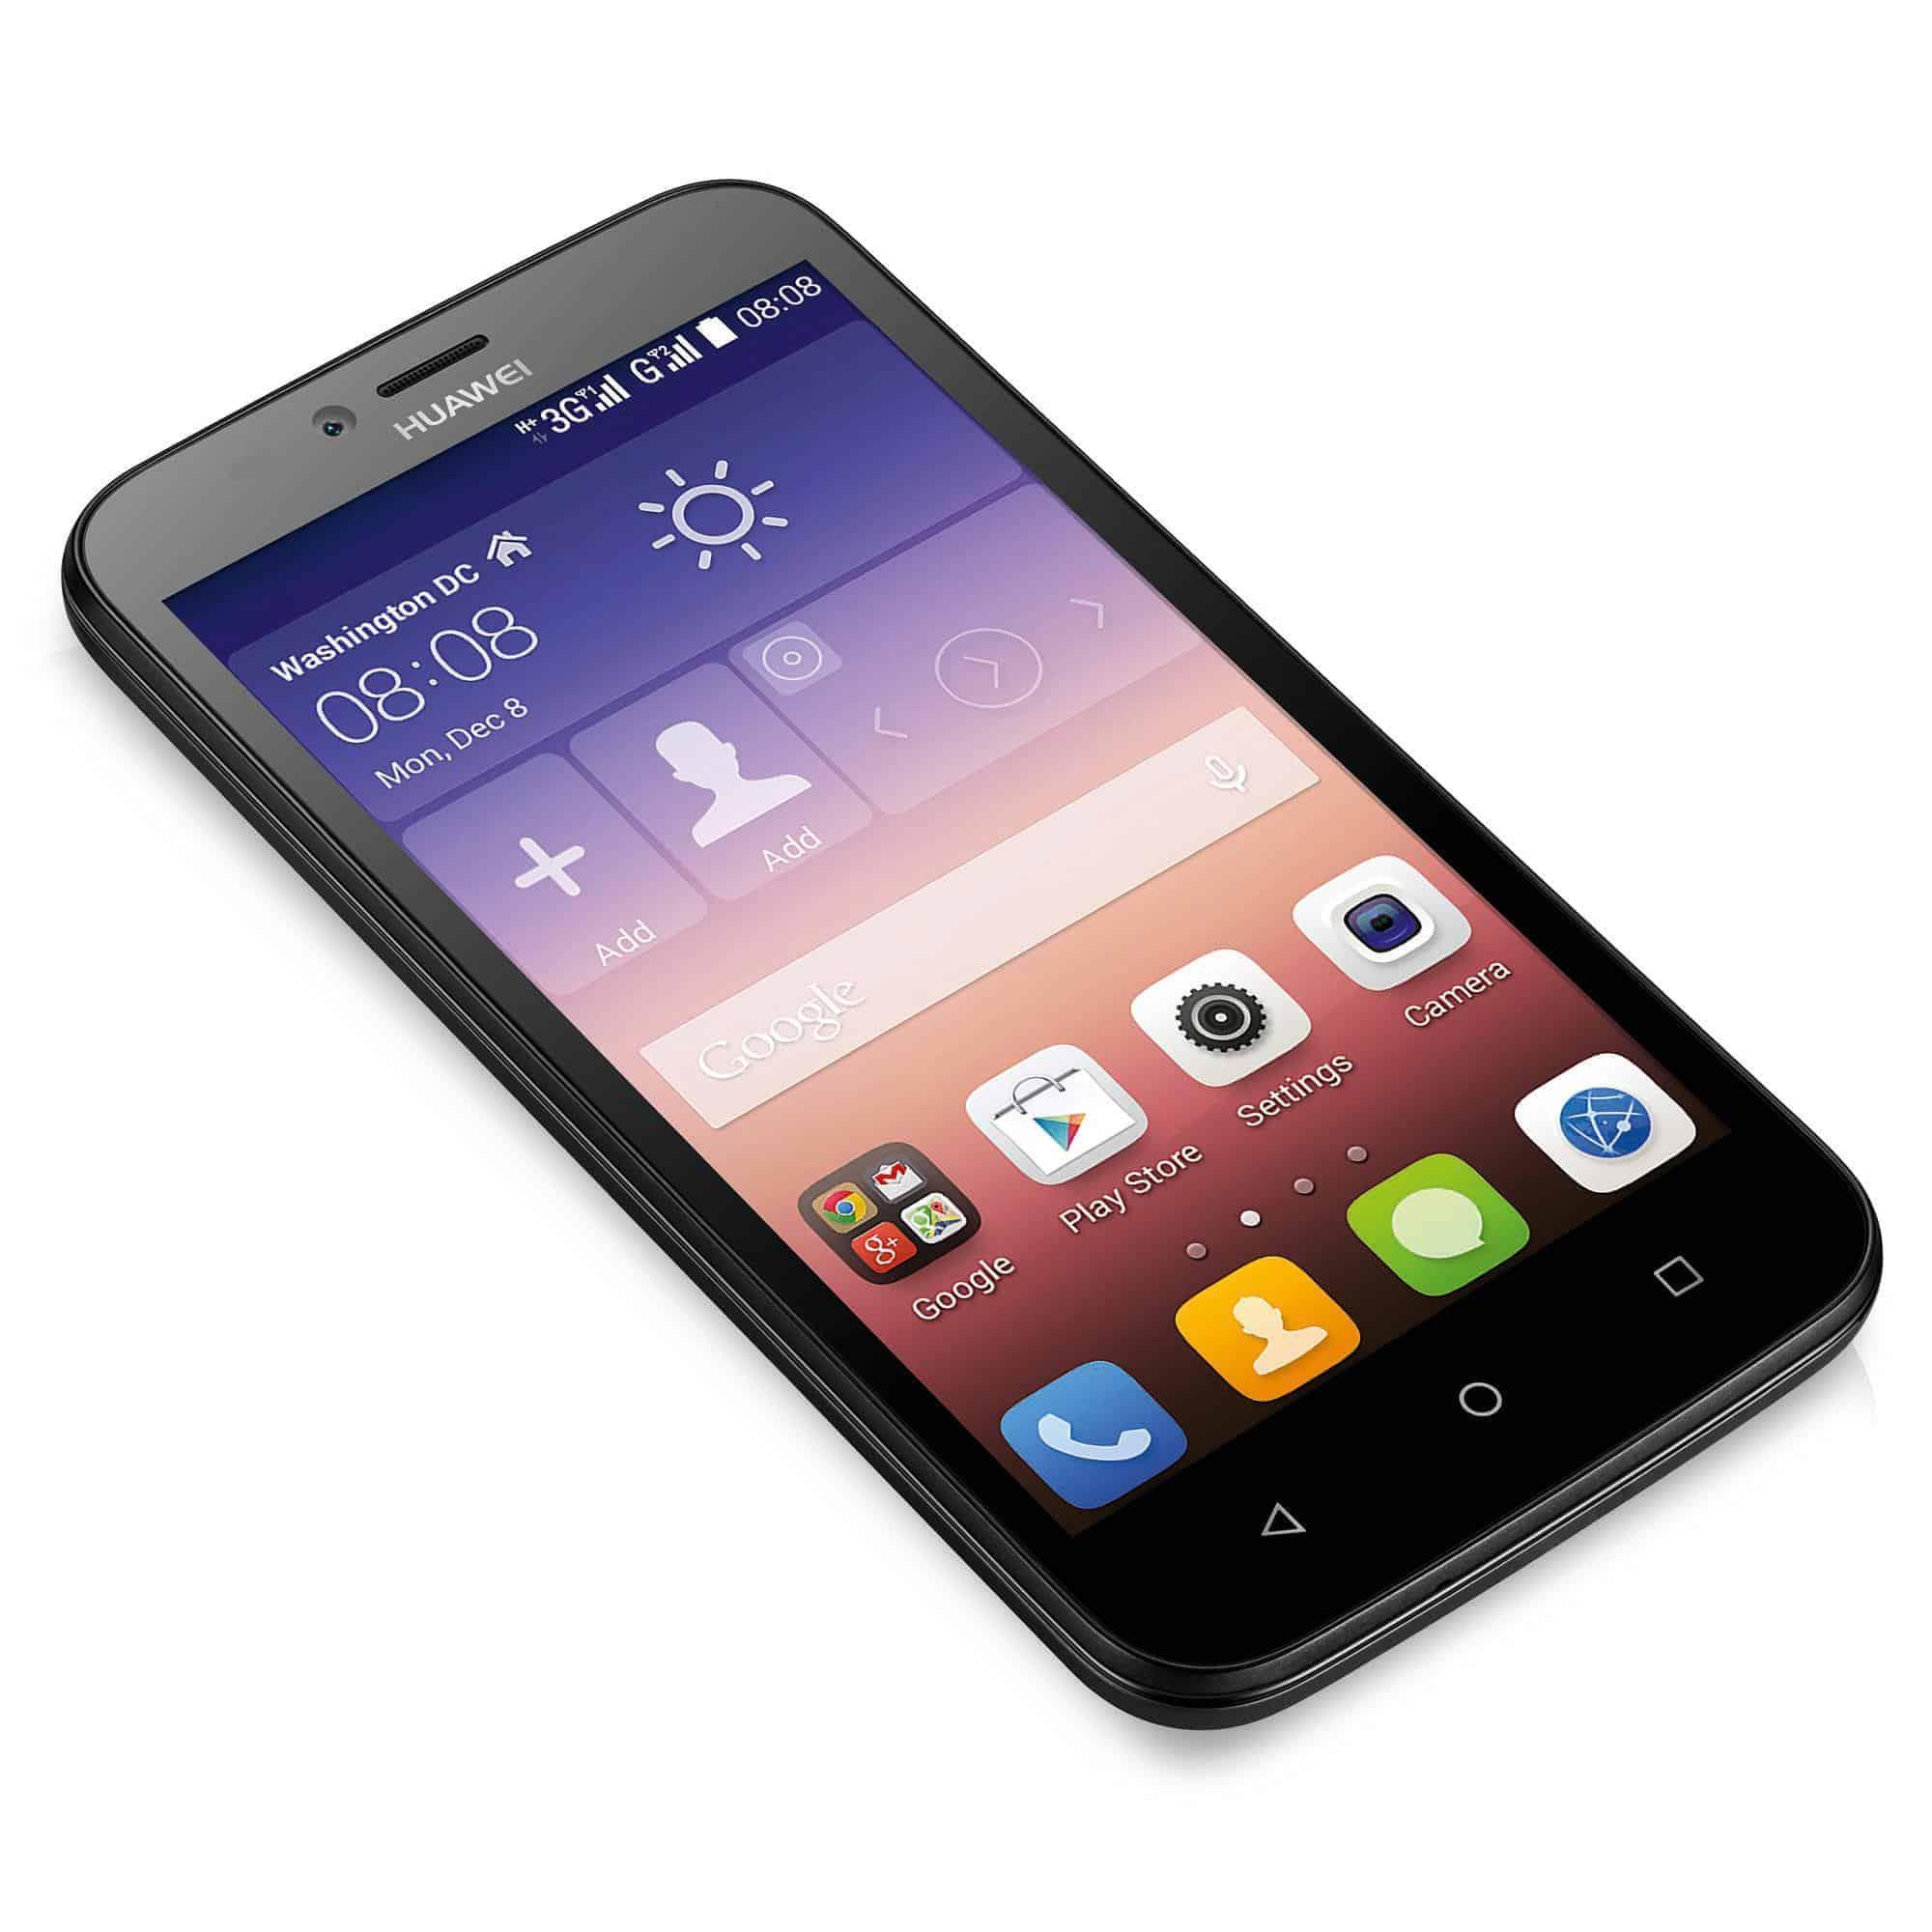 Huawei Y625 - Appook